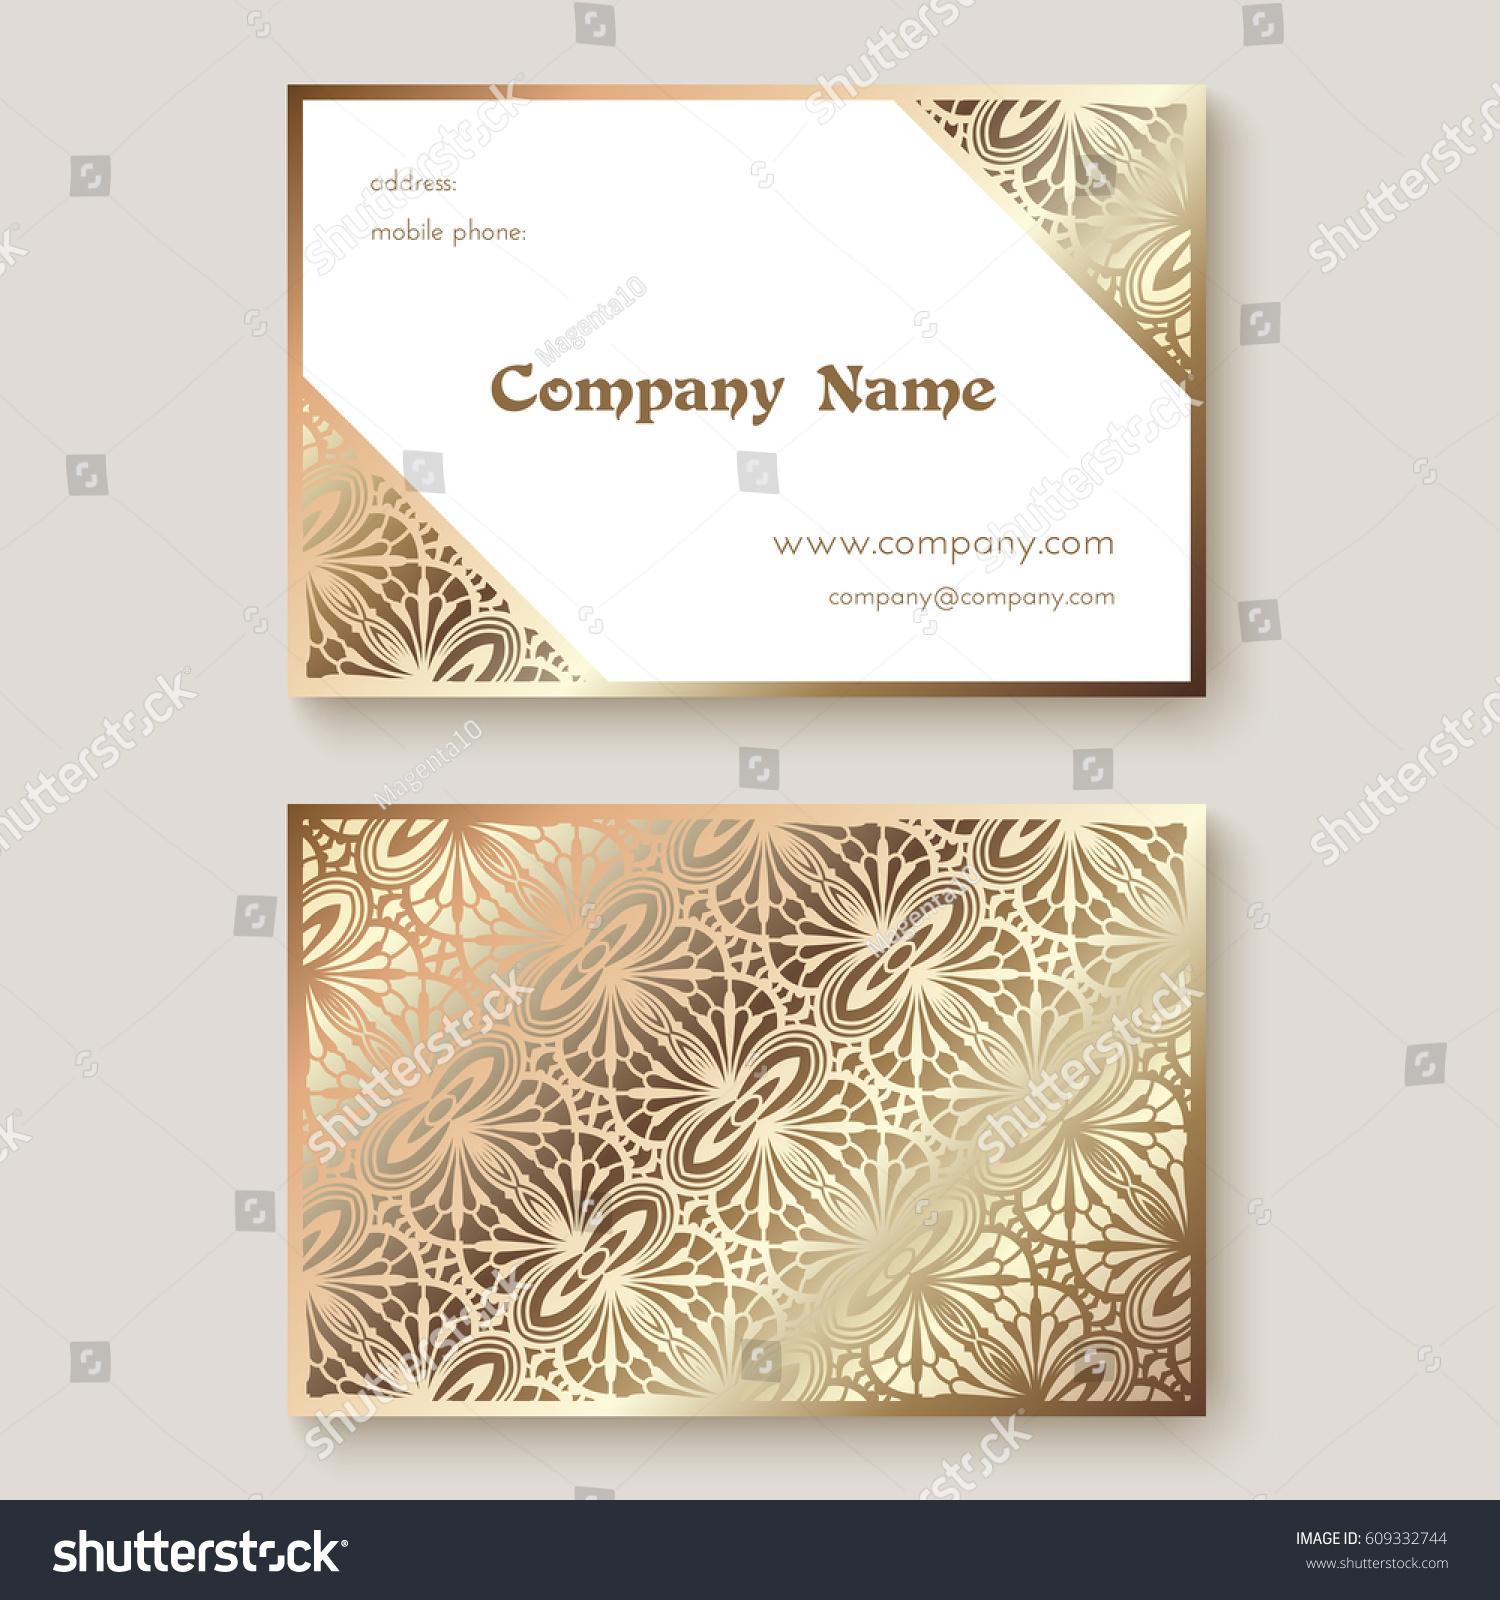 gold business card metallic foil texture stock vector